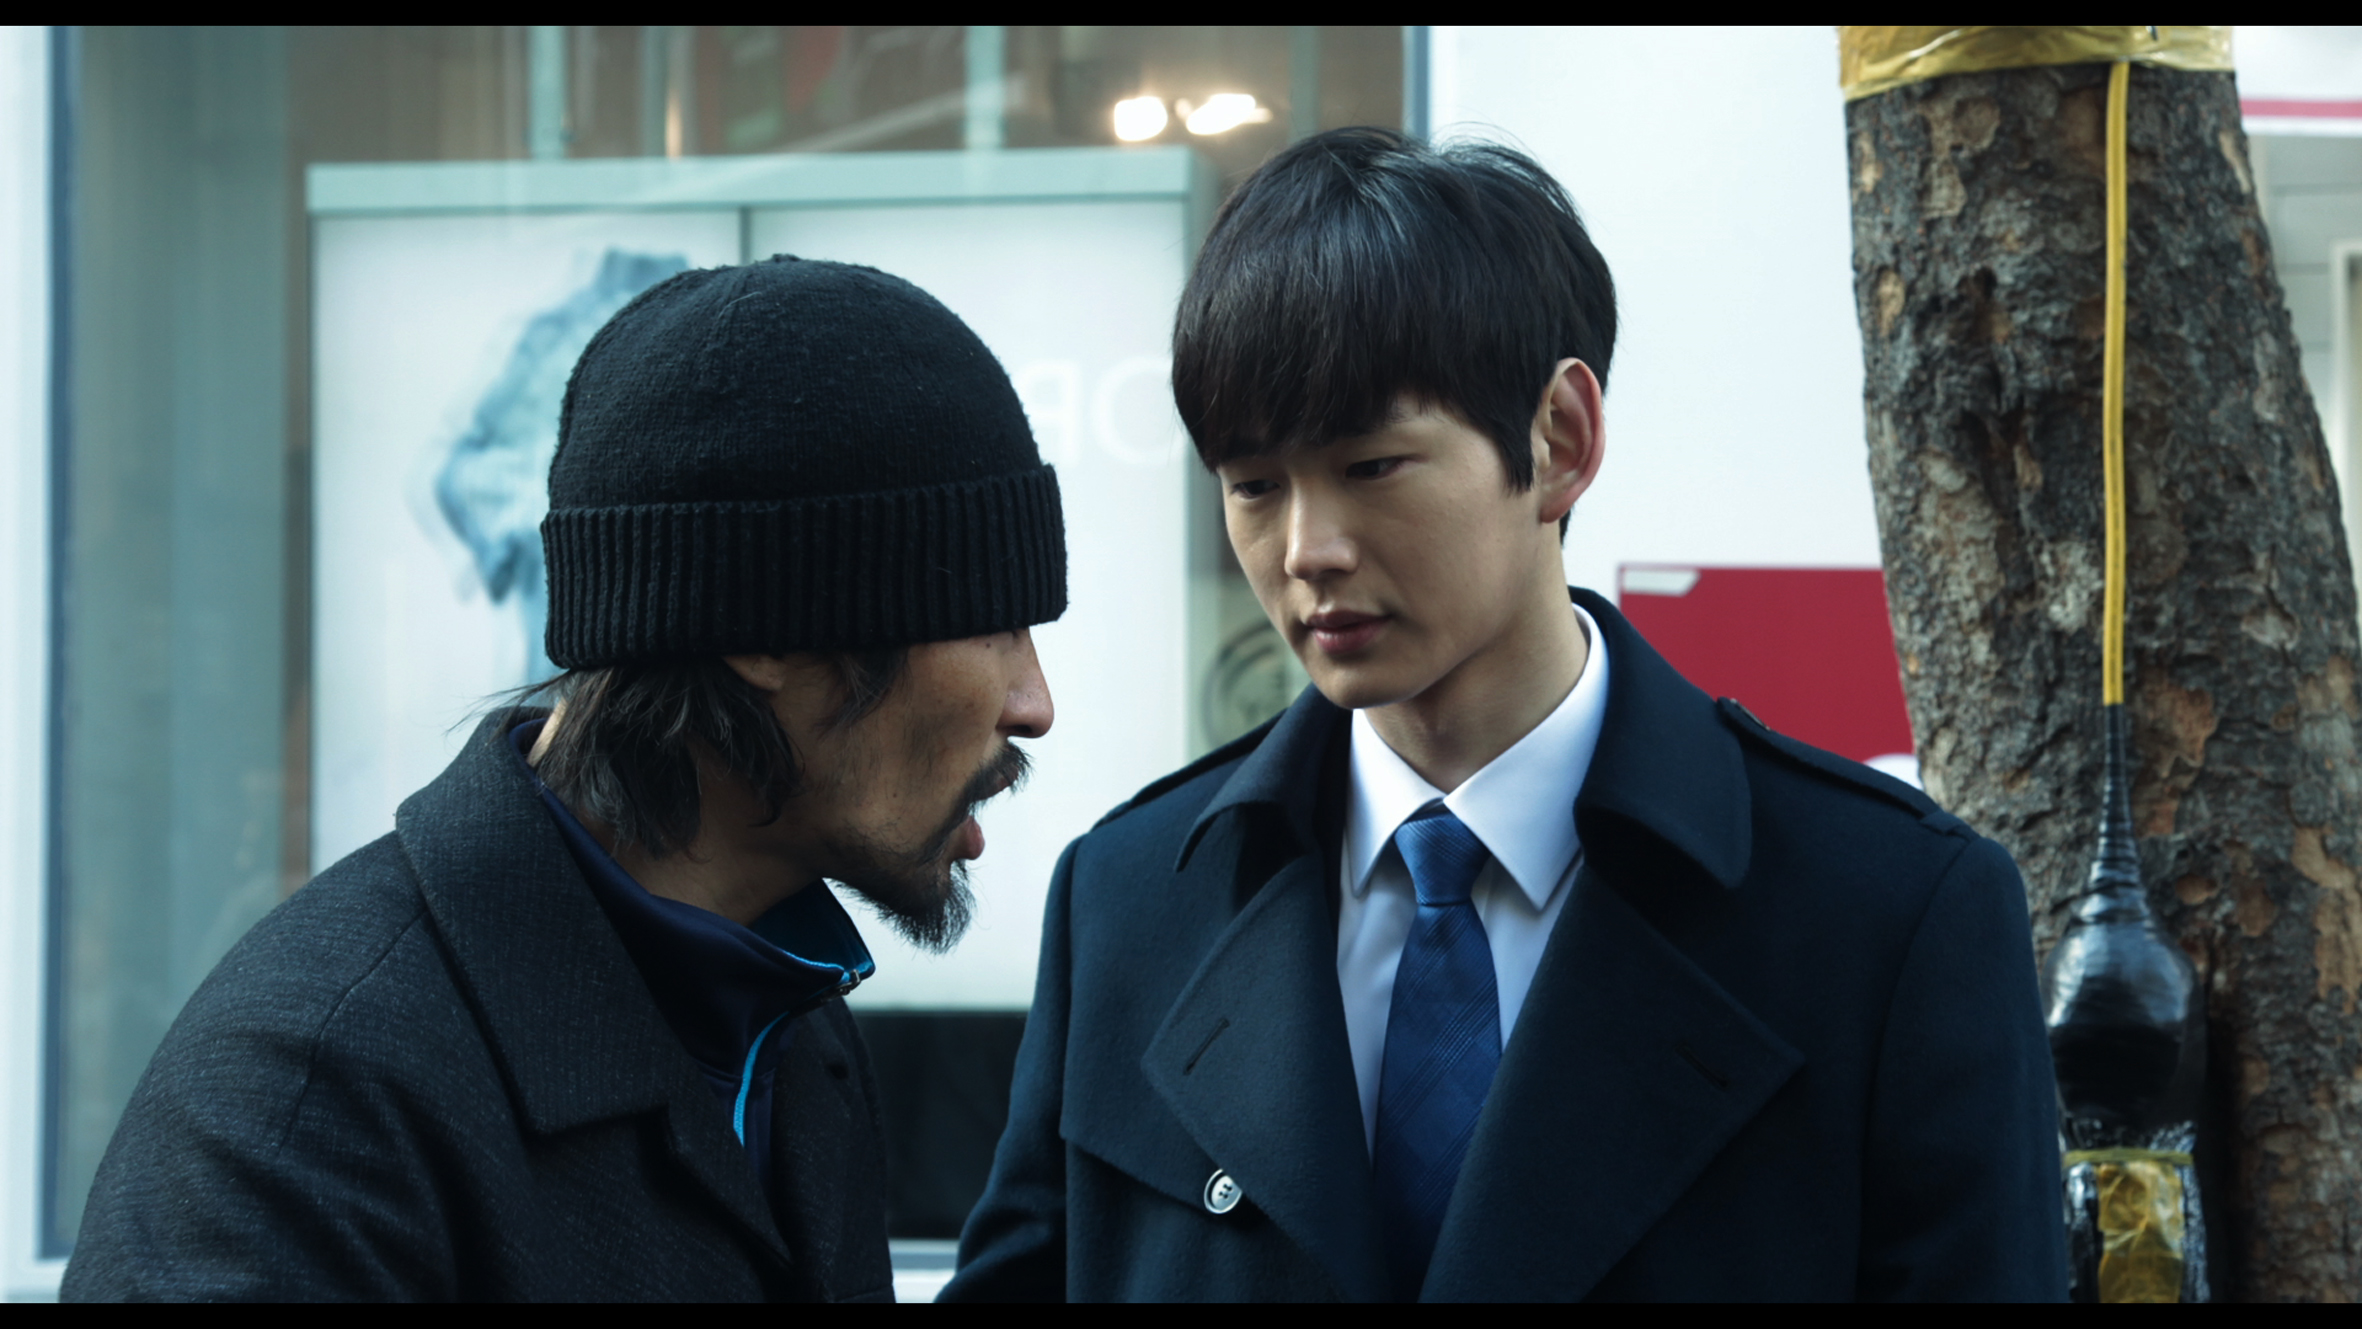 Fiskeren Nam (Ryoo Seung-bum) forsvares av sin sørkoreanske vaktmann Oh (Won-geun Lee).